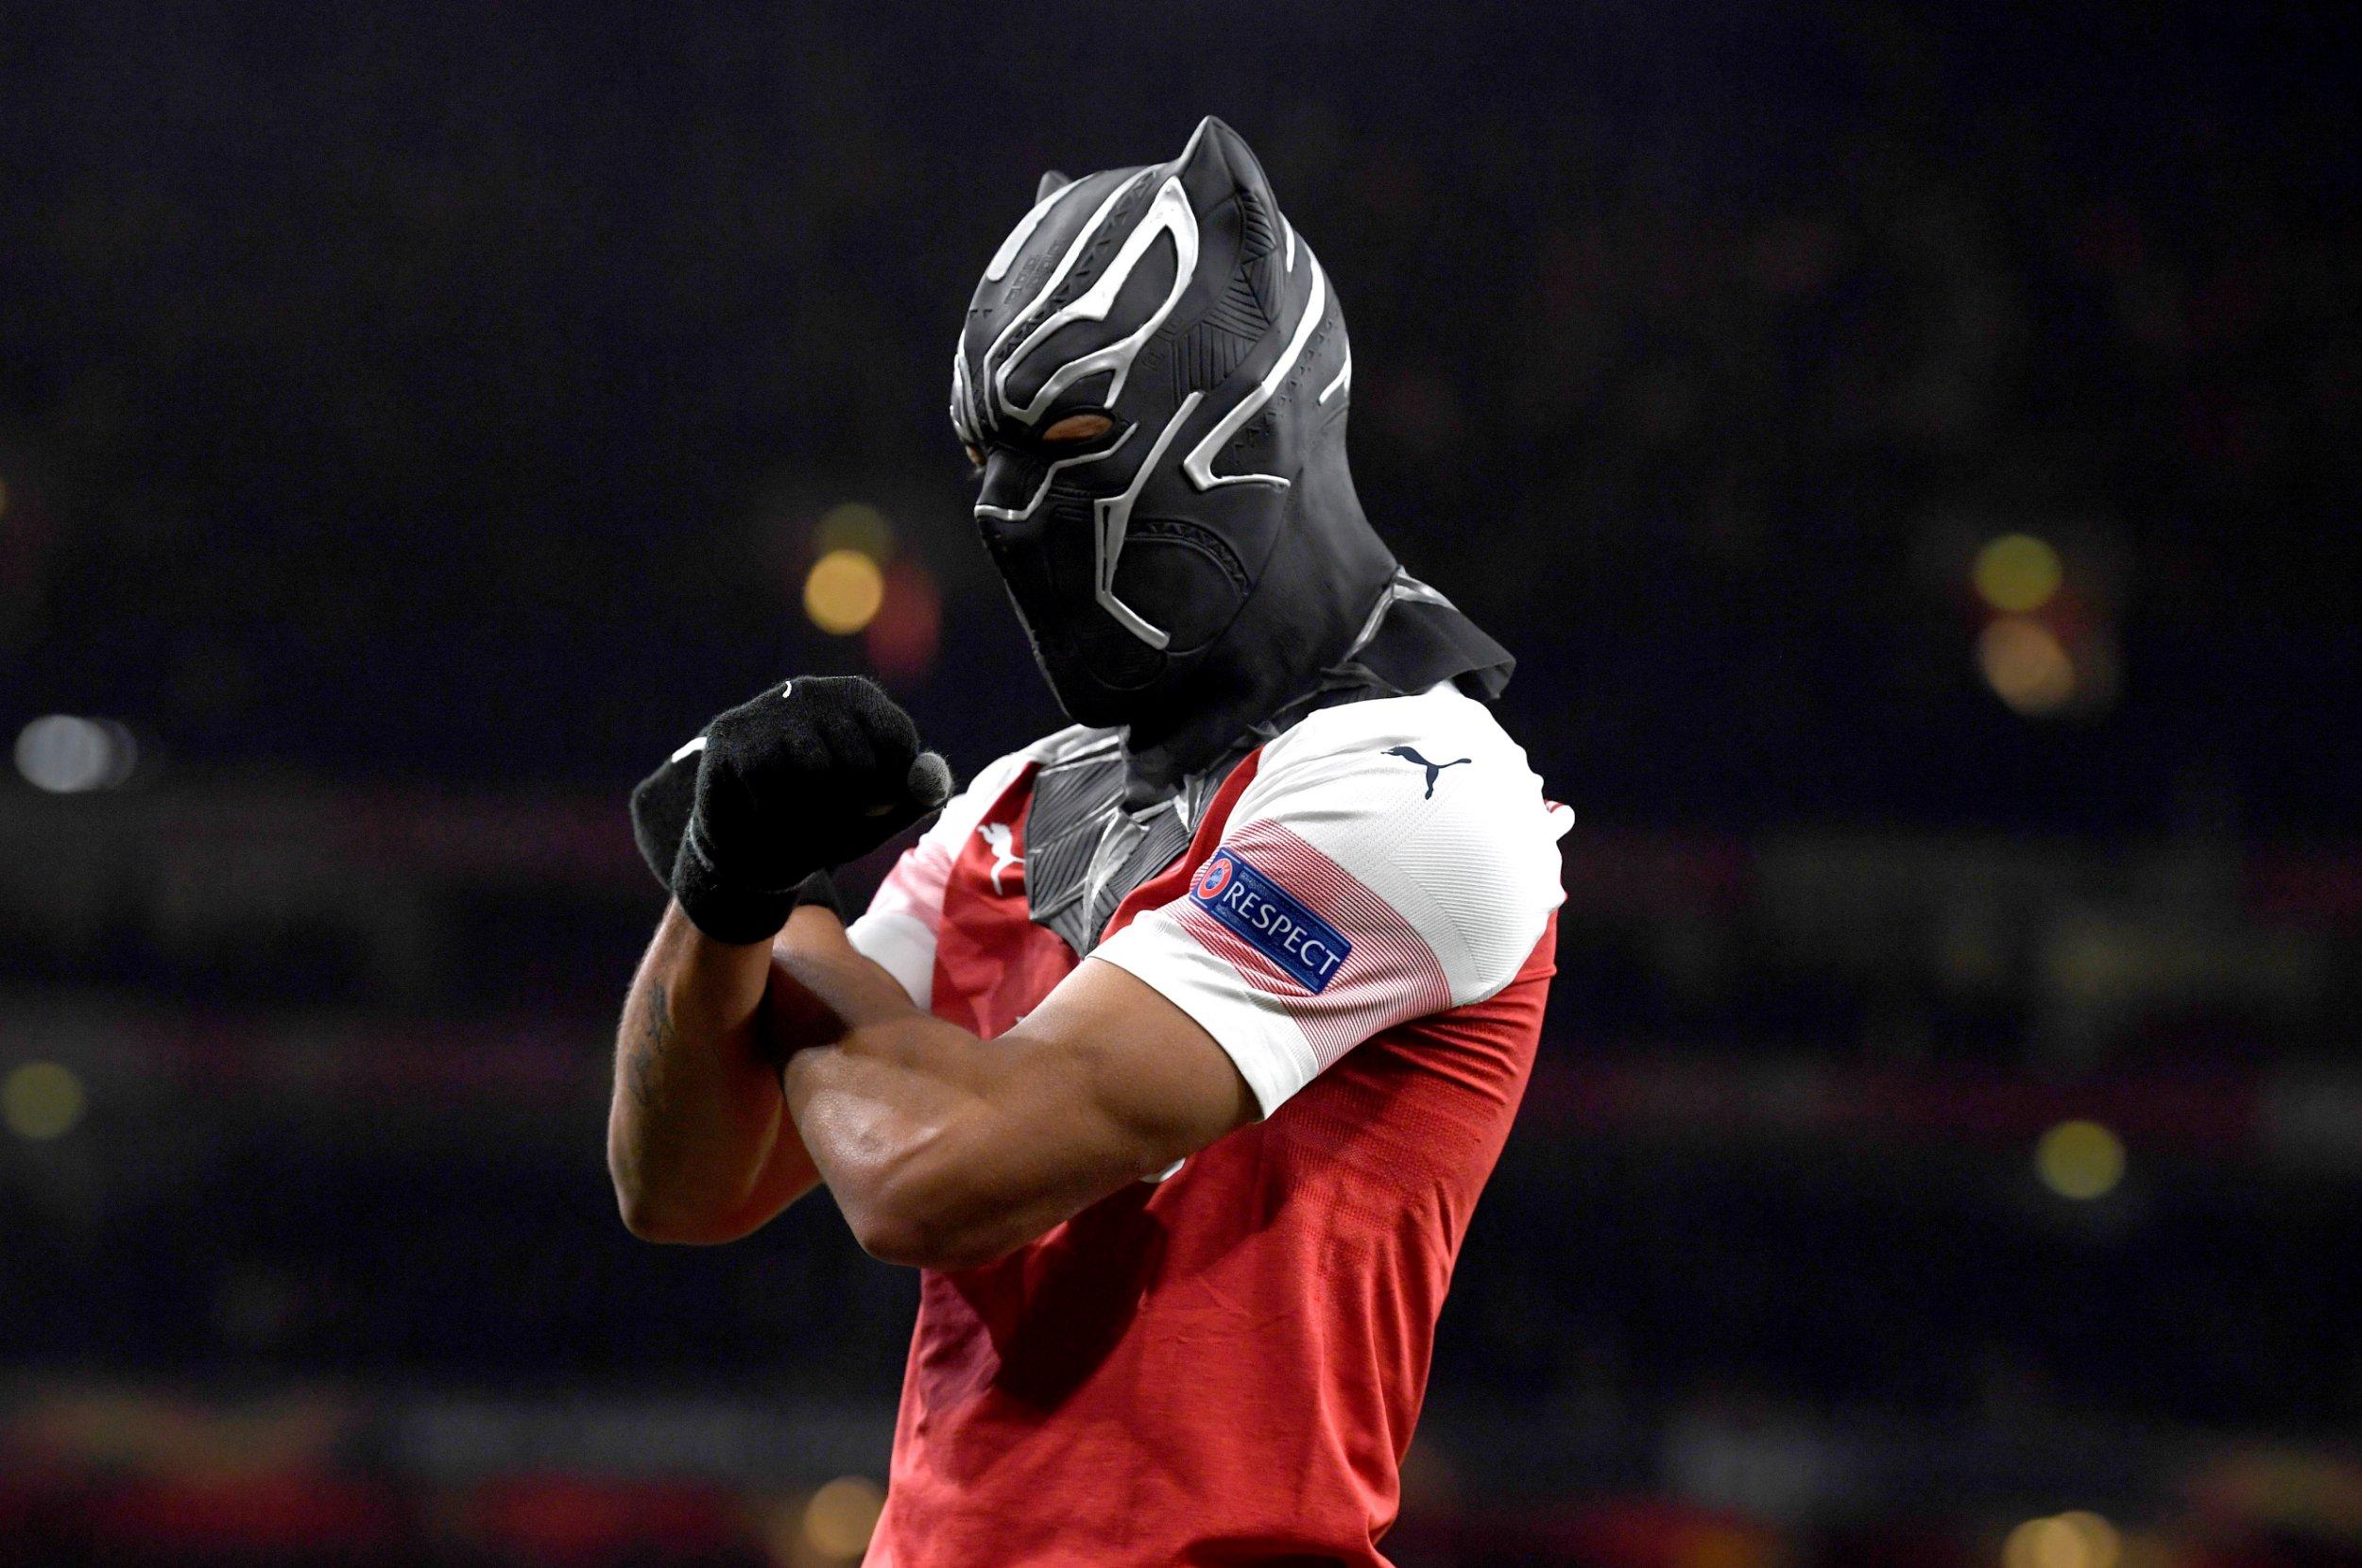 Pierre-Emerick Aubameyang on Black Panther celebration: It represents me